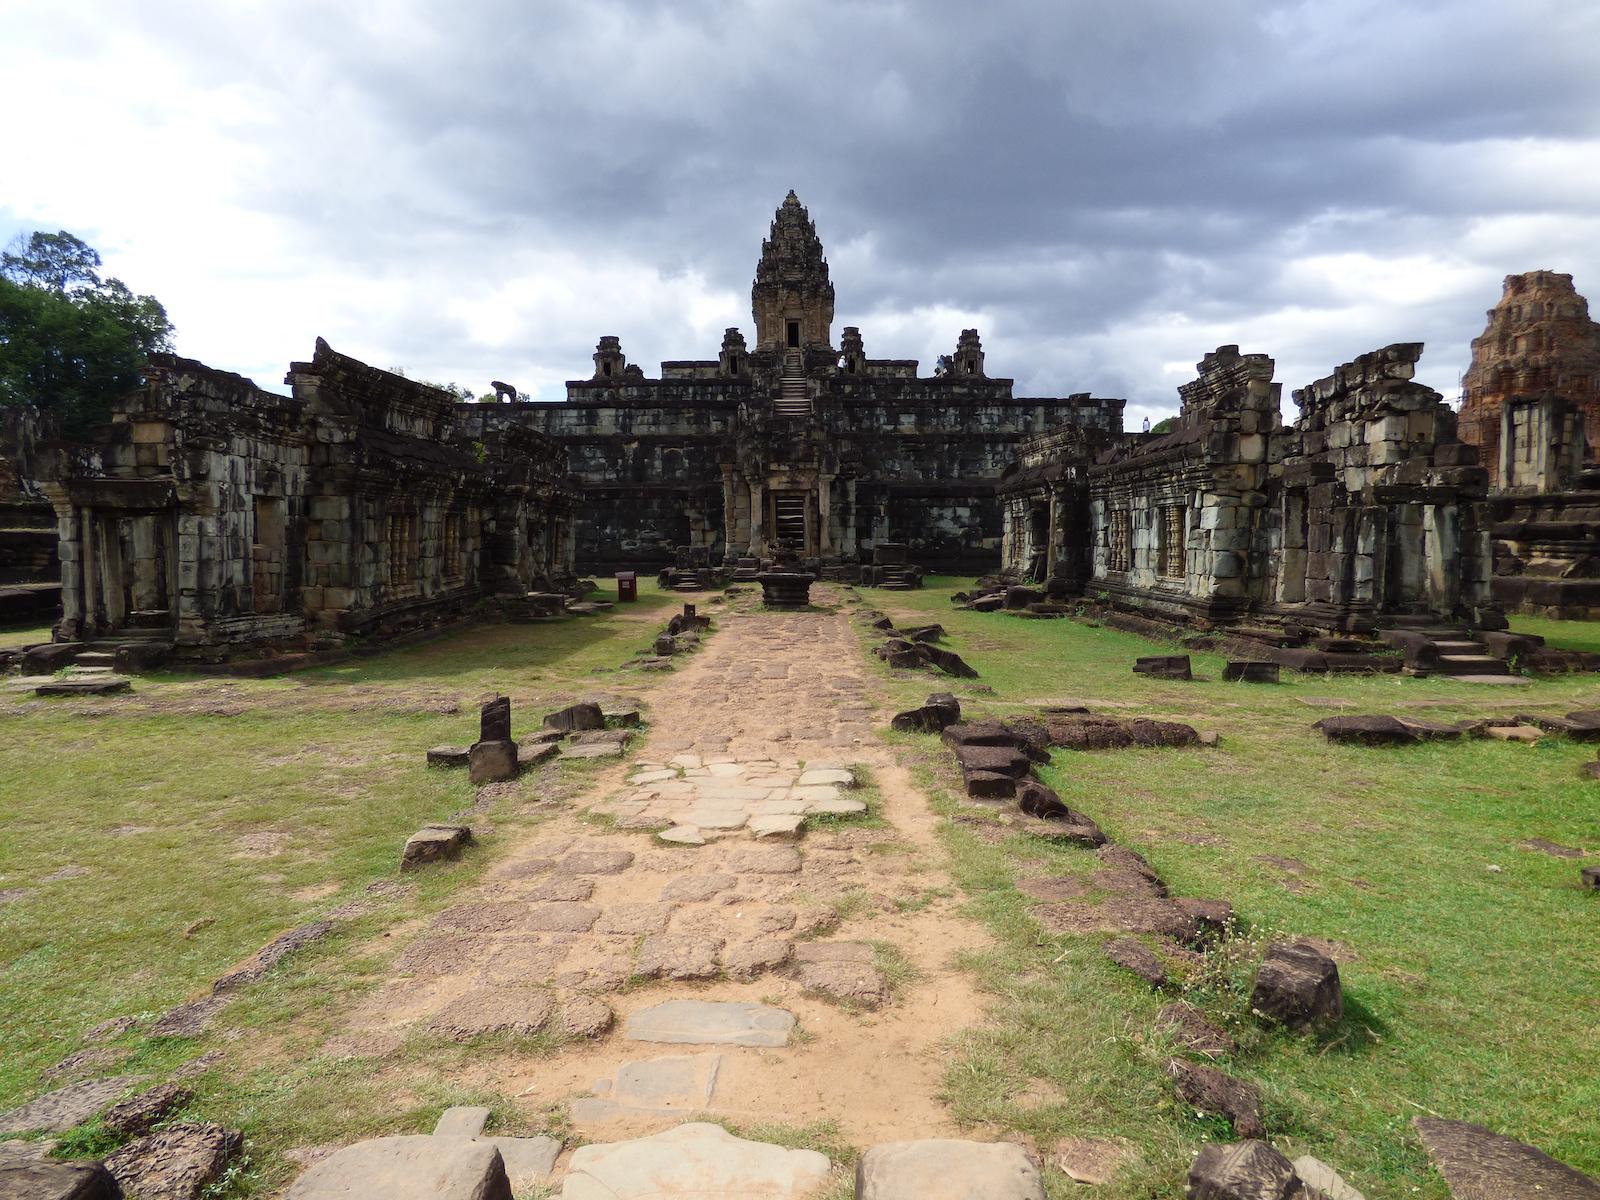 tourameo-reiseplaner-reiseziel-abenteuer-kambodscha-tempel